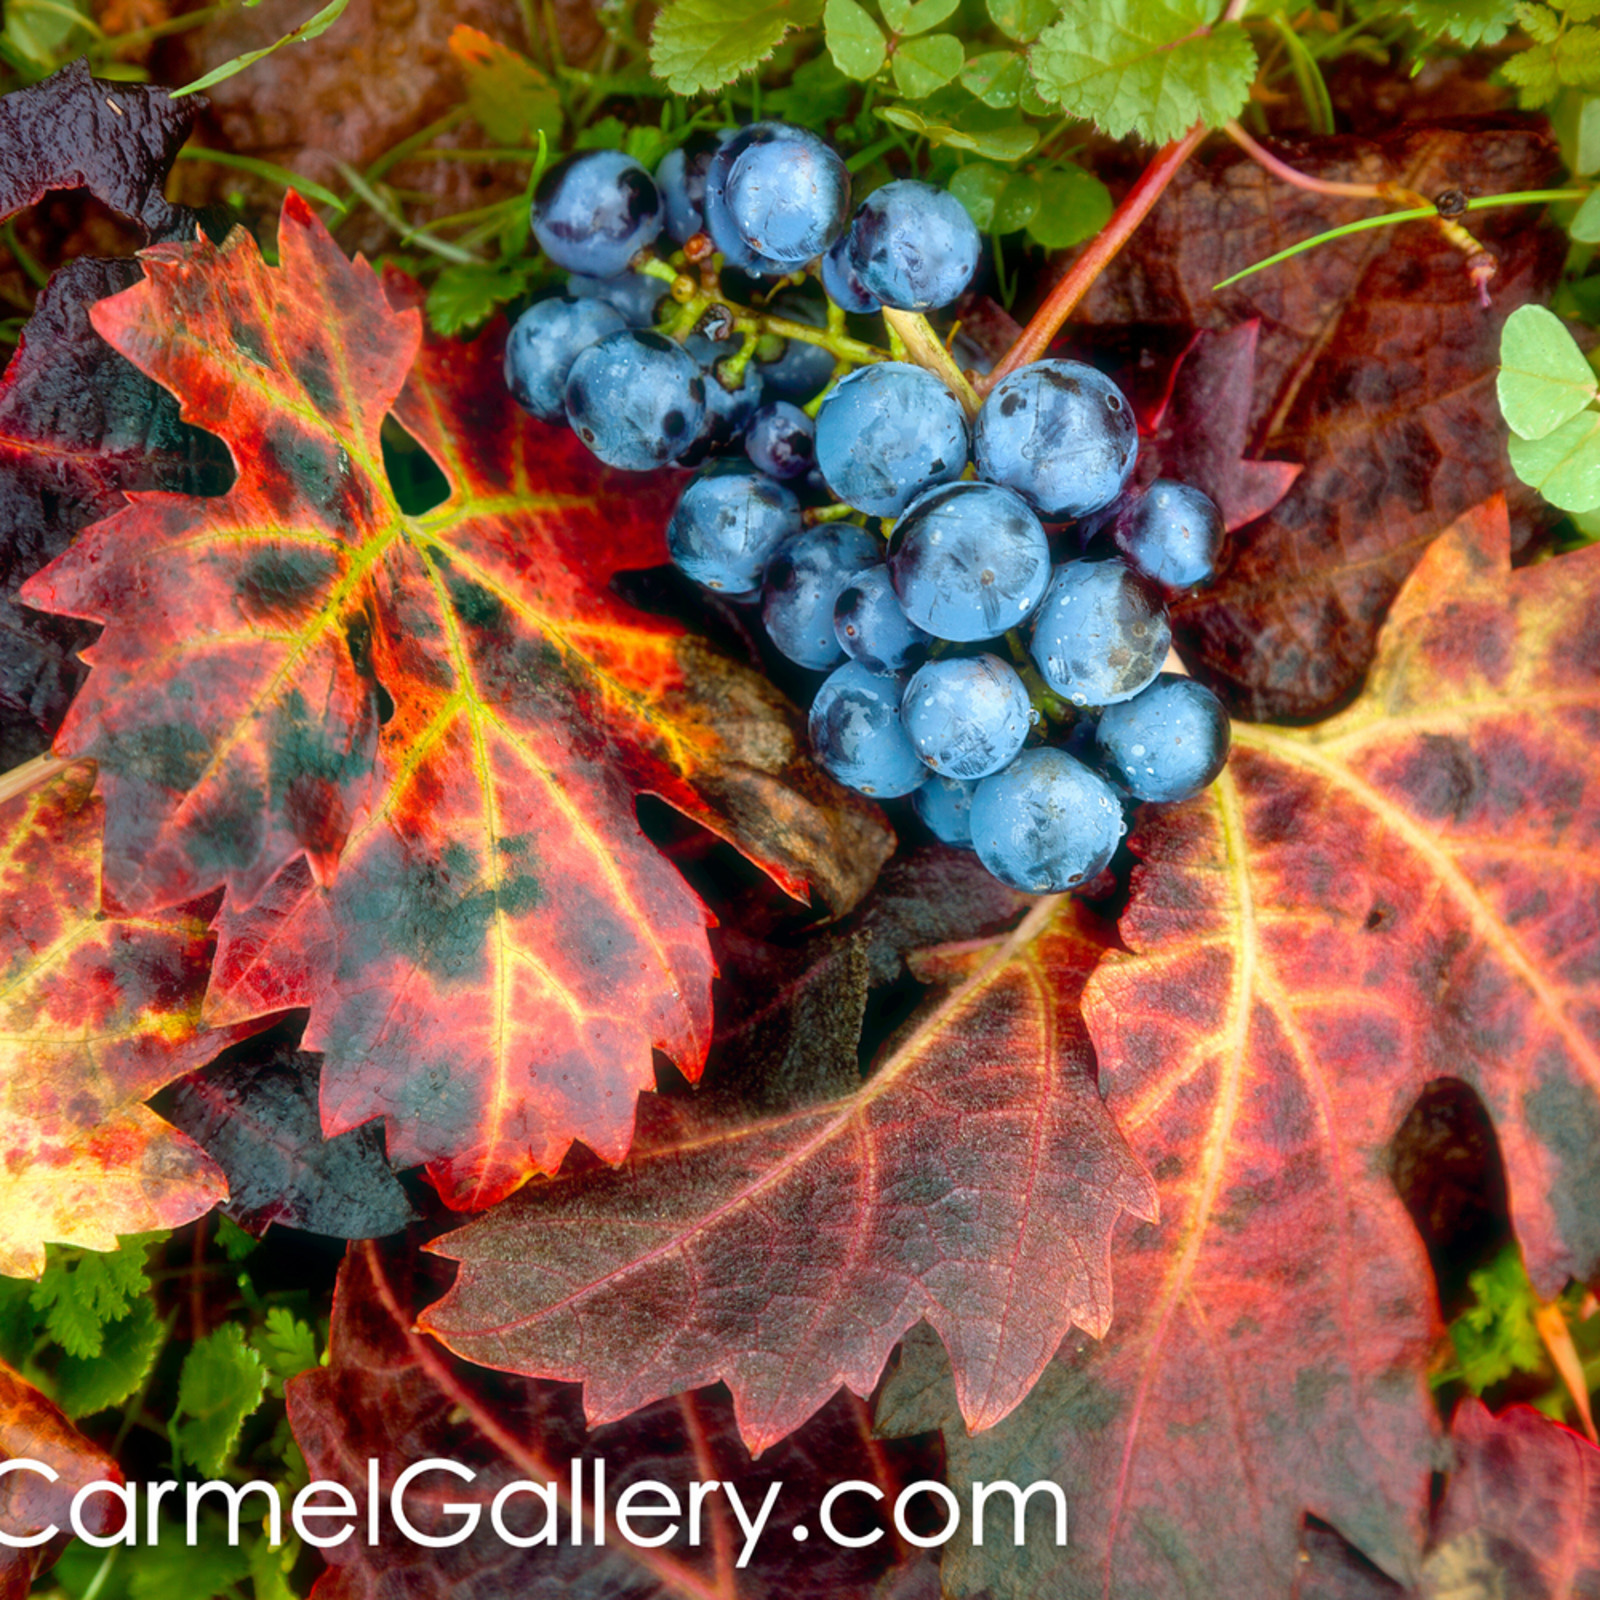 Autumn vines and grapes ob3gwj